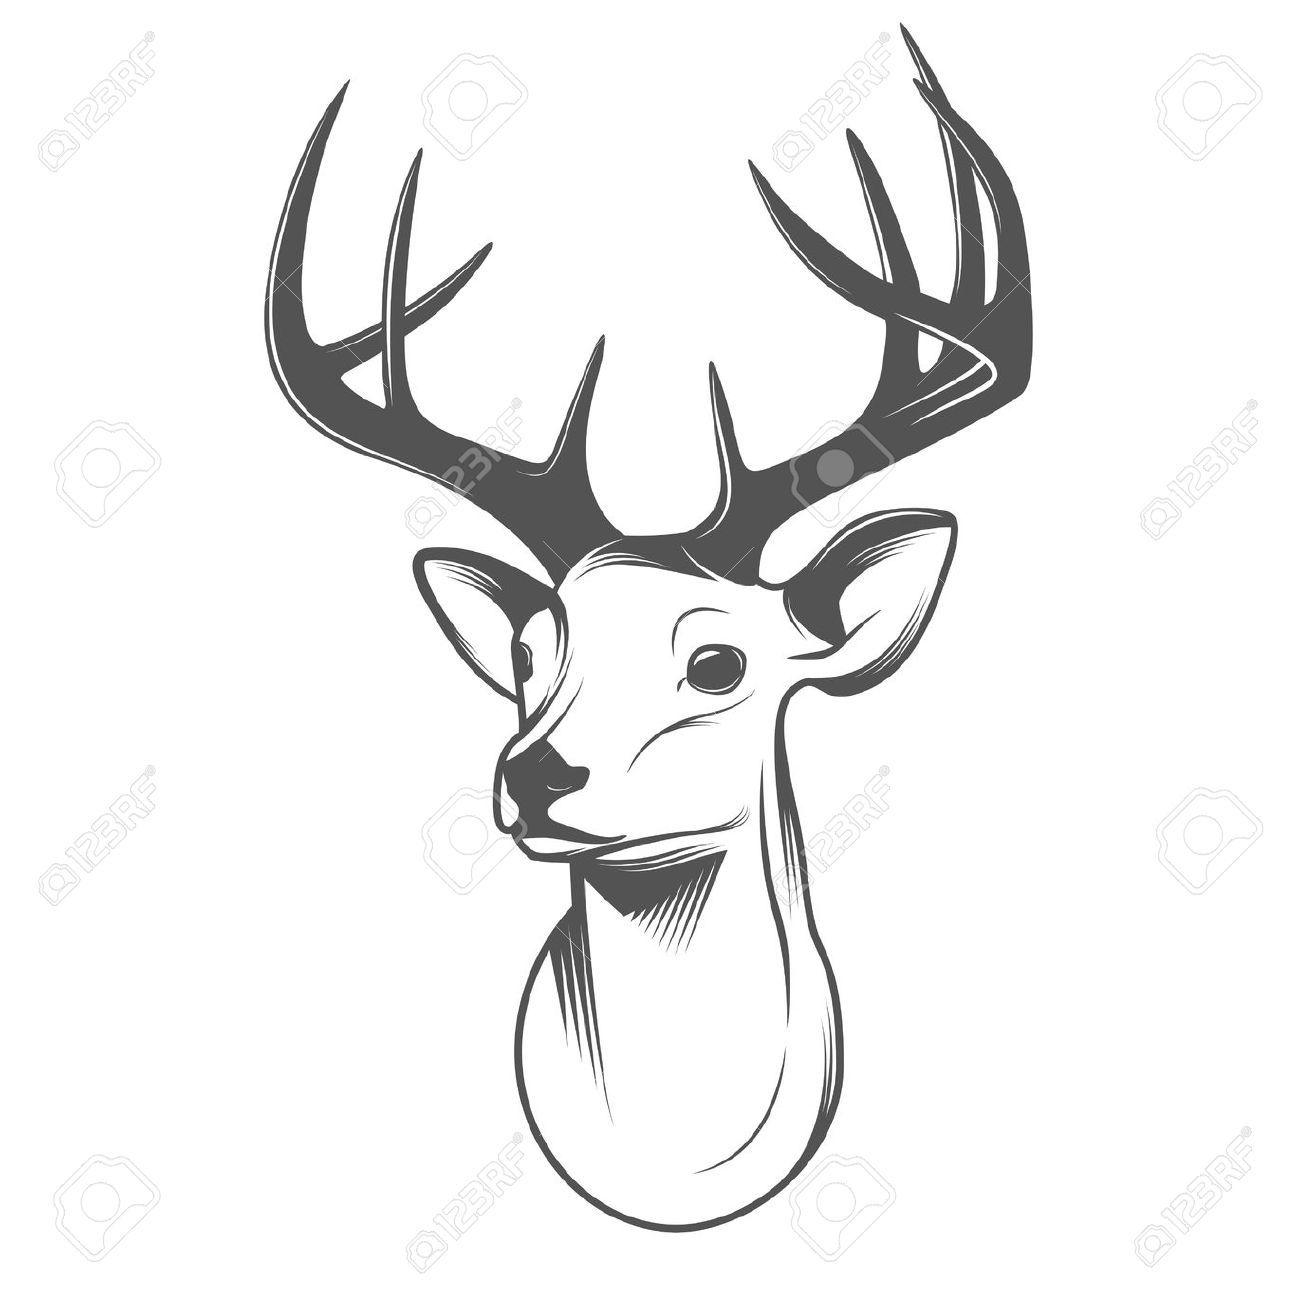 Cabeza ciervo dibujo buscar con google tattoo ciervo for Cabeza de ciervo